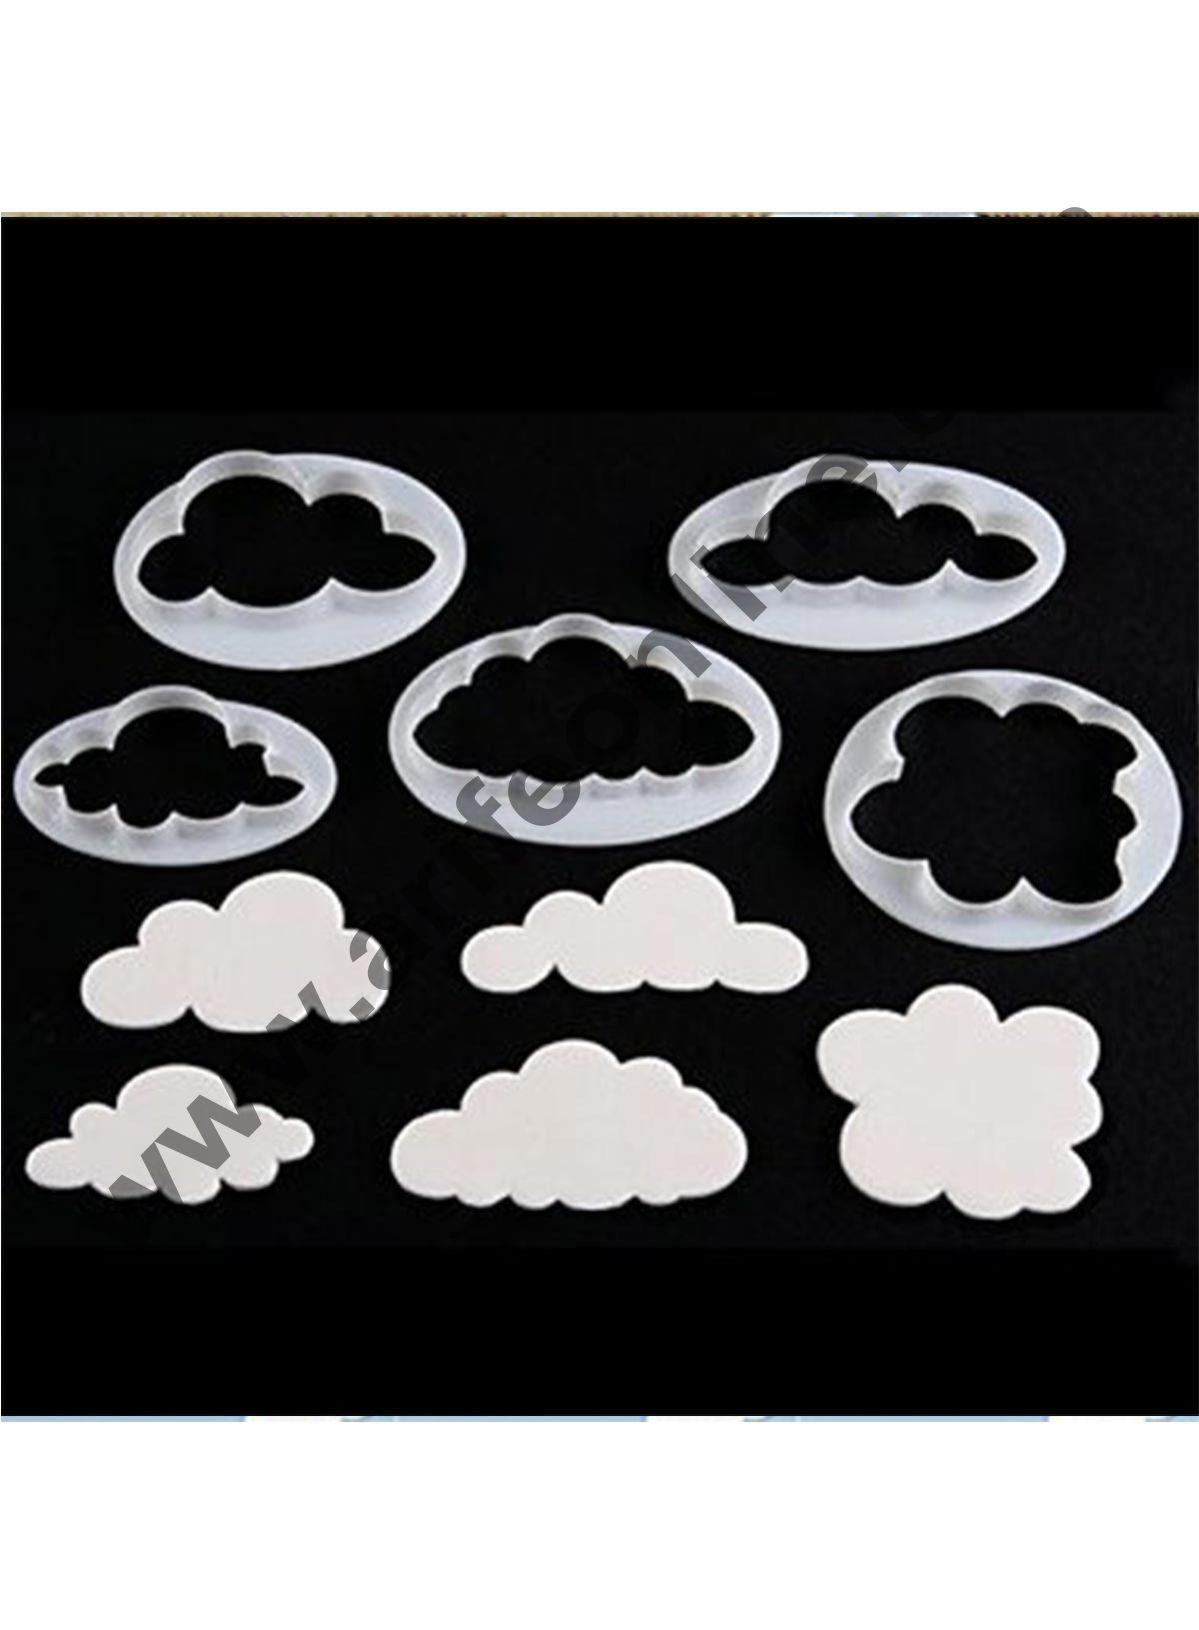 Cake Decor 5PCS Different Plastic Fluffy Cloud Cutters Cookie Cutters Cake Cutters Fondant Cloud Cutters